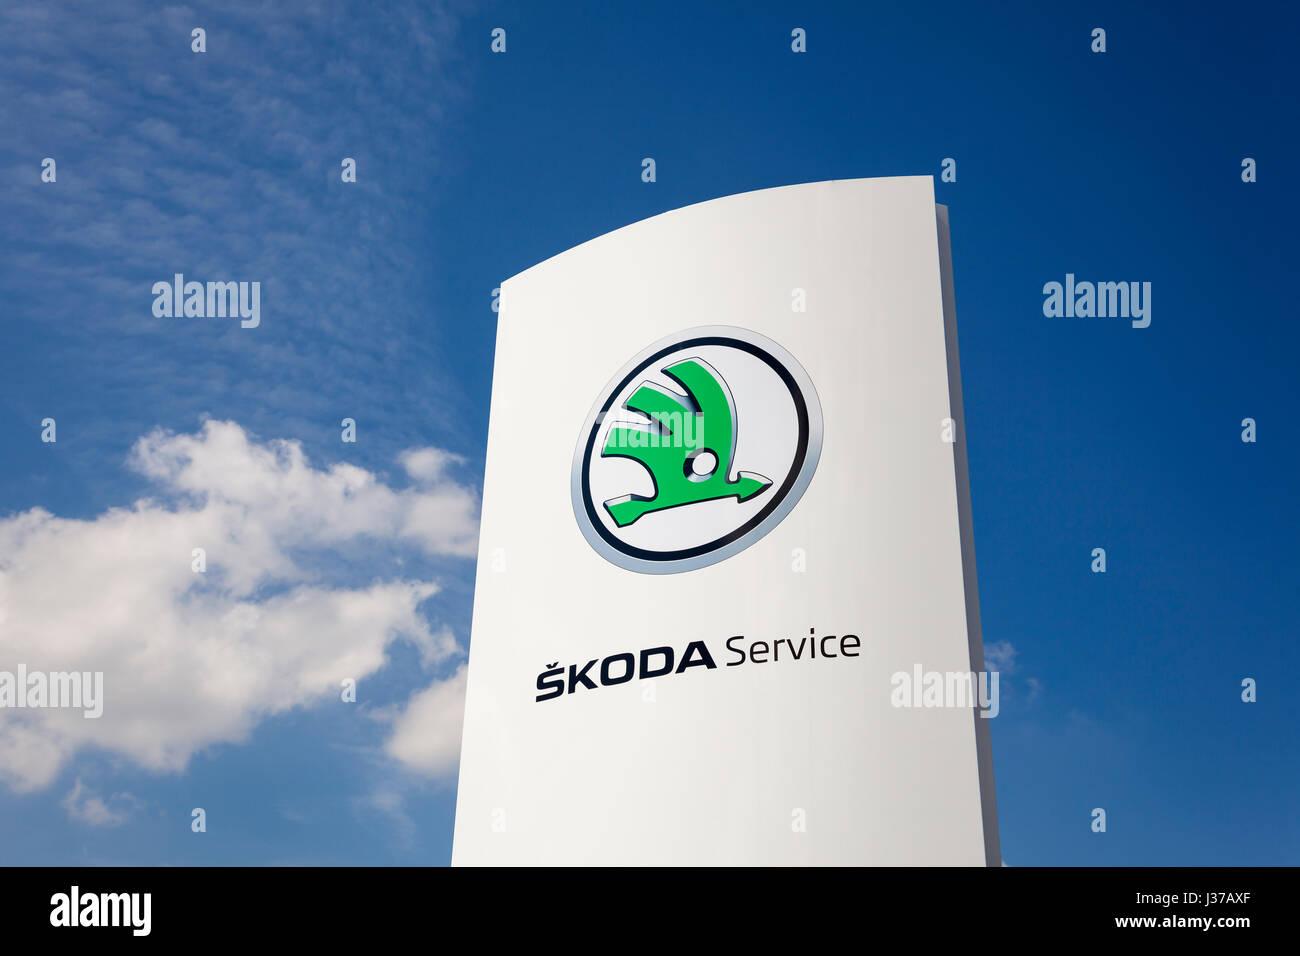 Frankfurt, Germany - March 30, 2017: Skoda automobile dealership in the city of Frankfurt, Germany - Stock Image